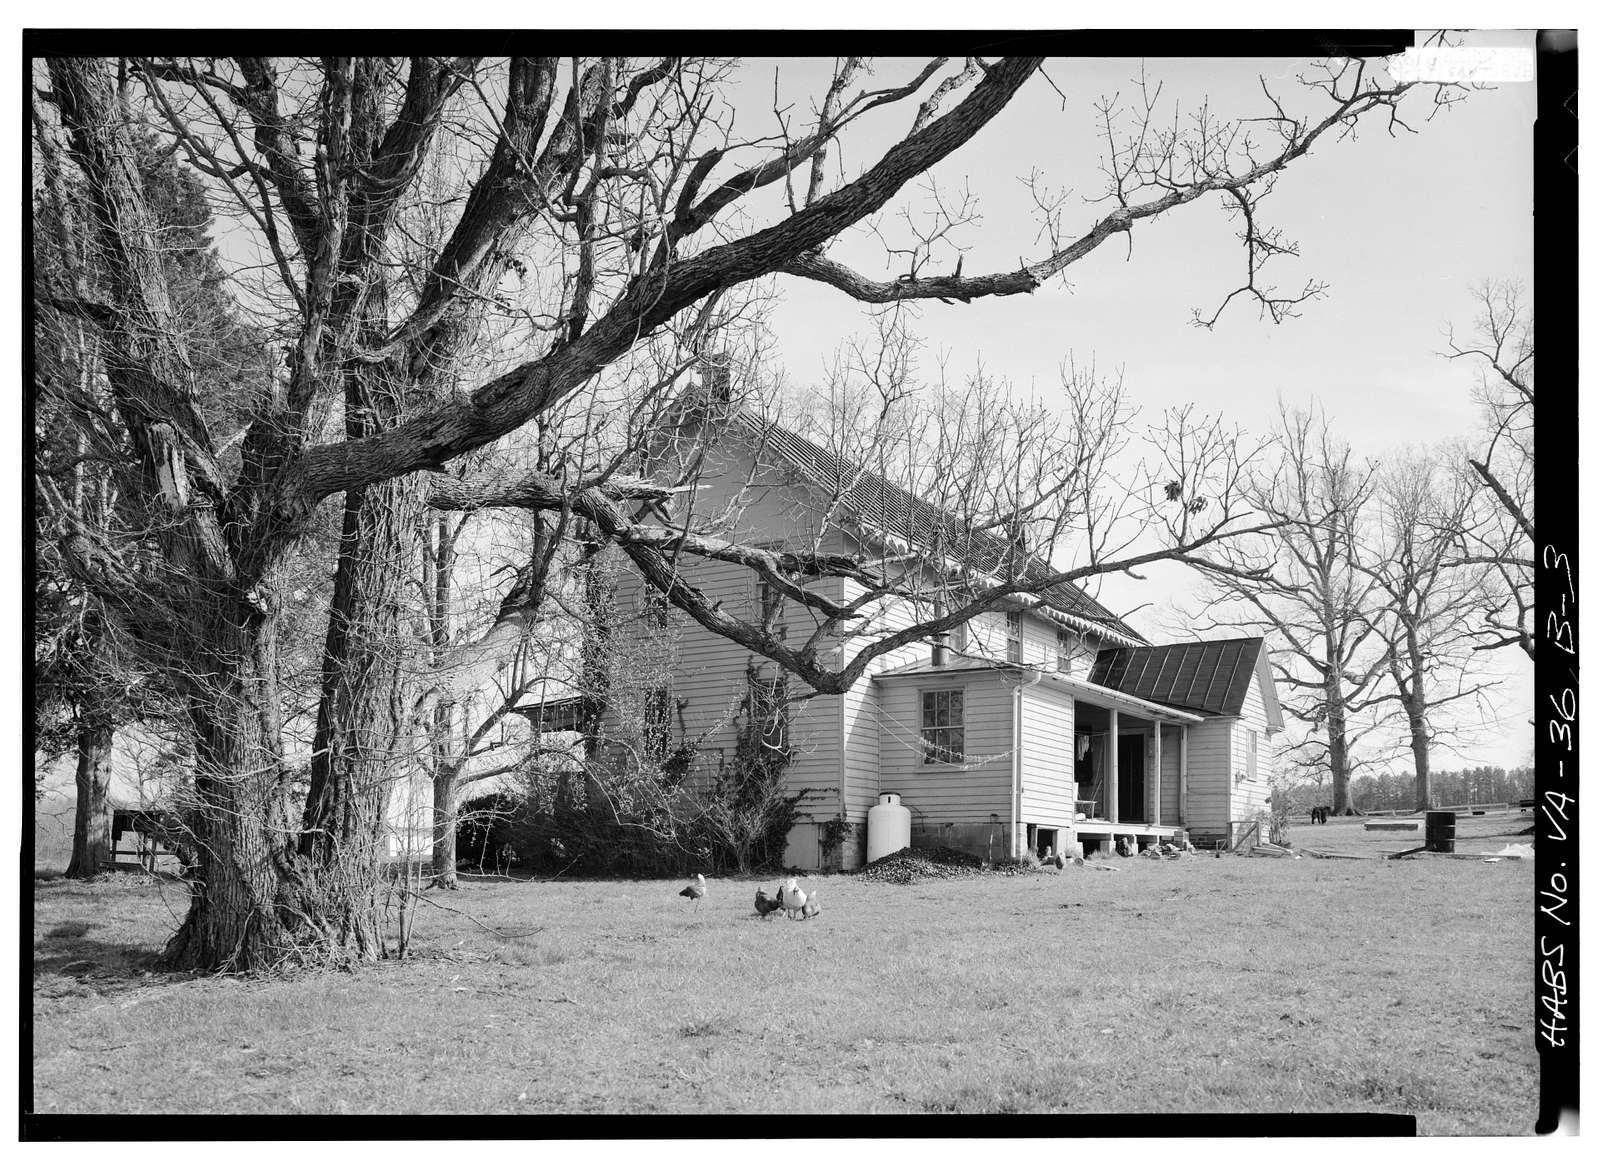 Hawkwood, Manager's House, Route 15, Gordonsville, Orange County, VA